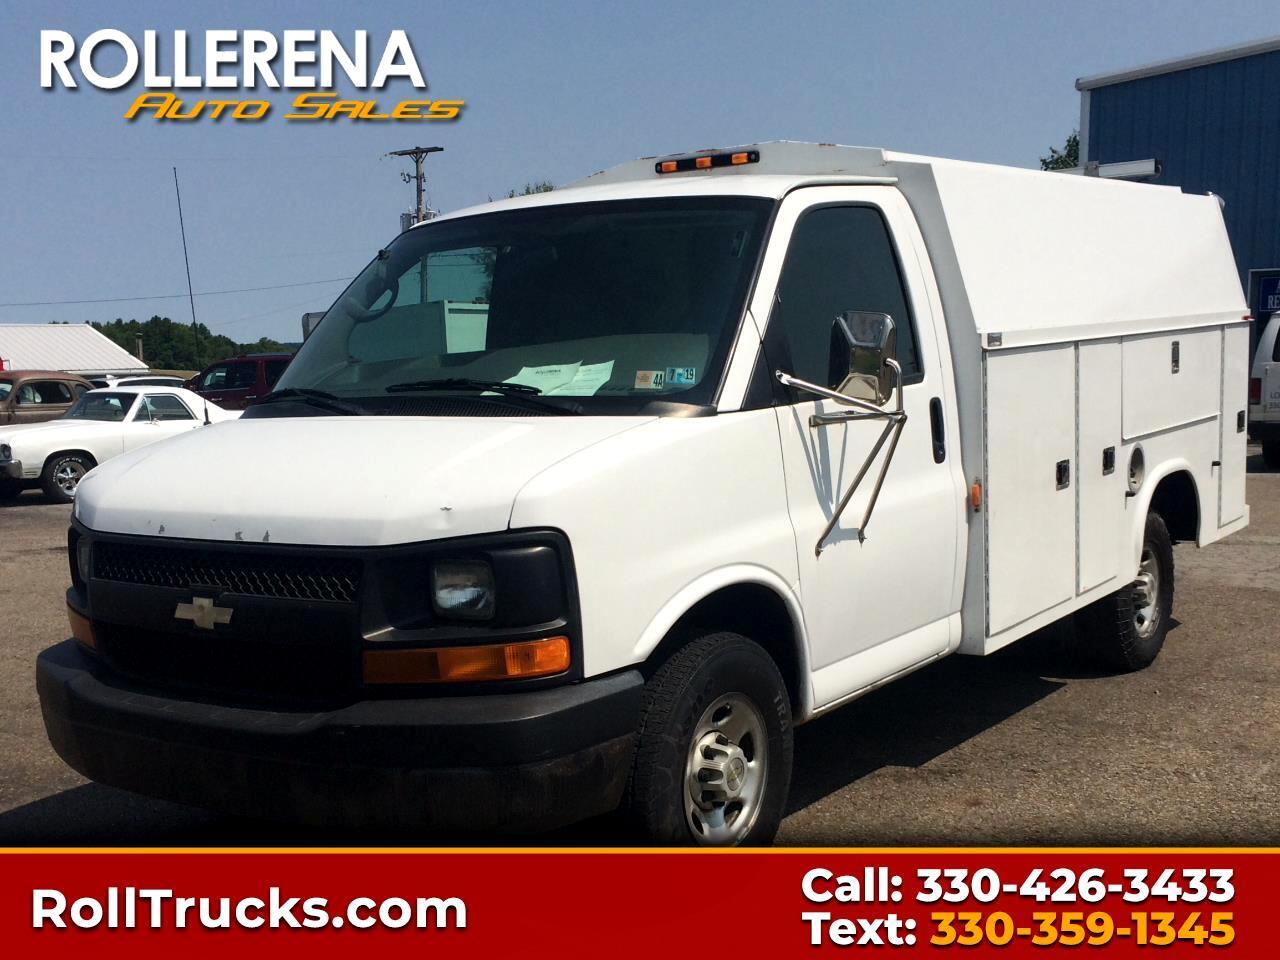 2006 Chevrolet 3500 Utility Truck